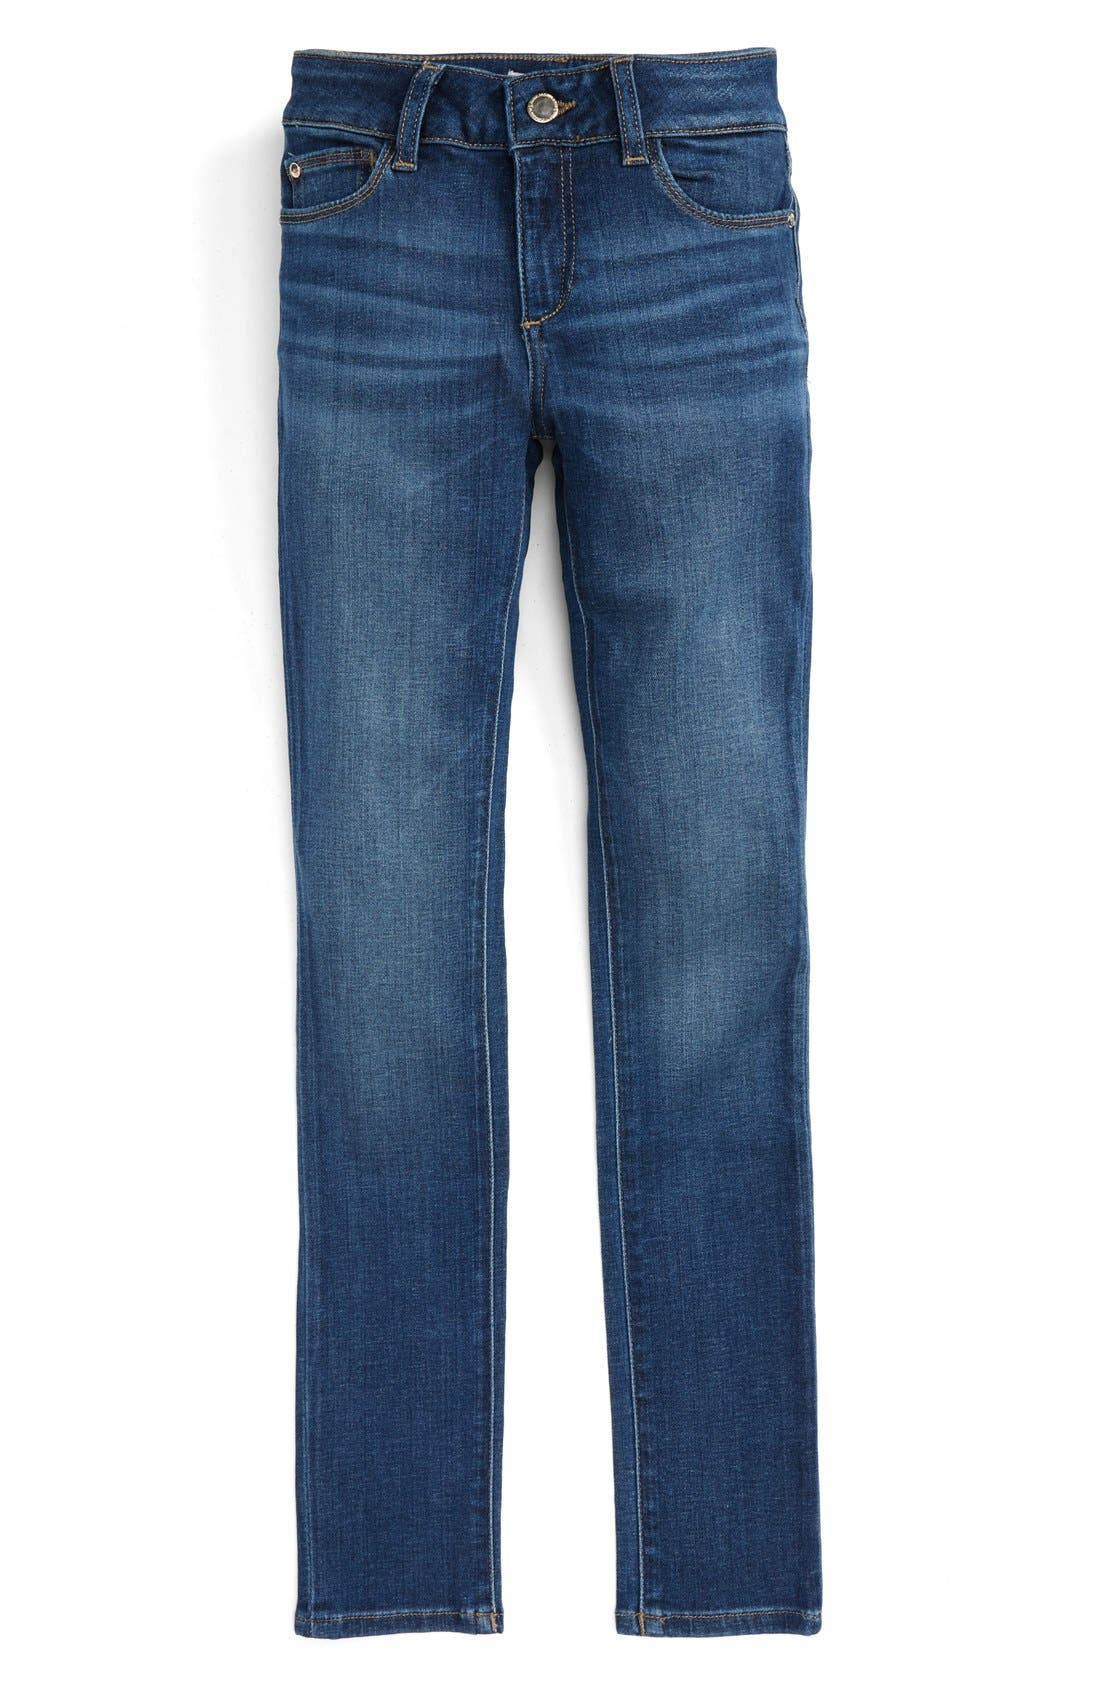 Chloe Mid Rise Skinny Jeans,                         Main,                         color, PARULA